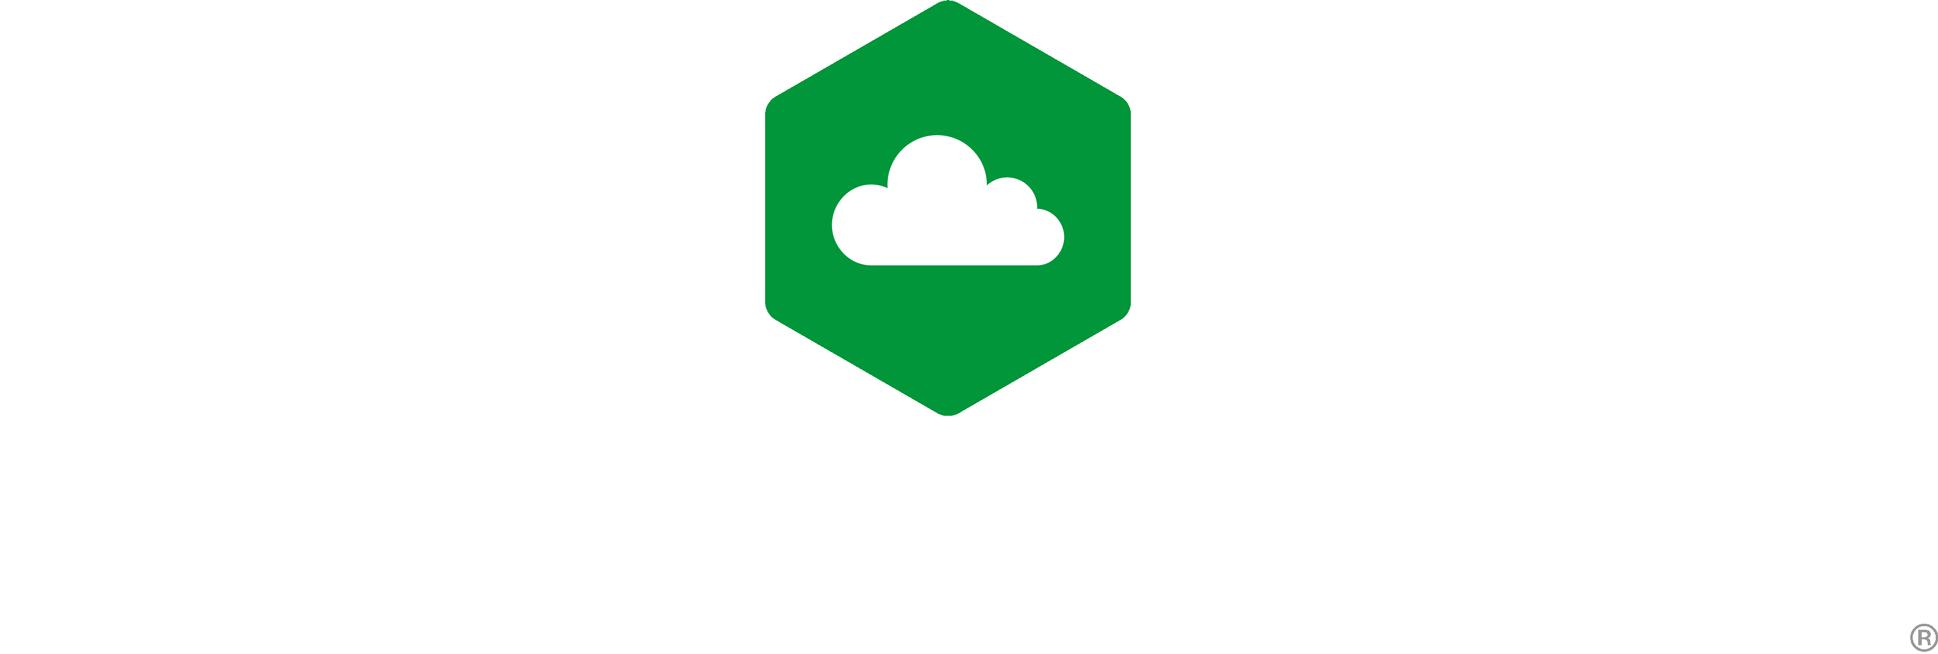 Logo des NGINX F5 DNS Cloud Services als Teil des NGINX Produktportfolios